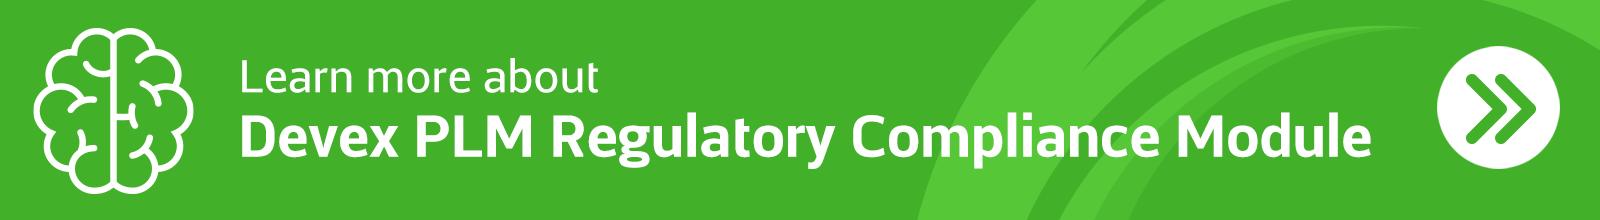 Devex-PLM-regulatory-compliance